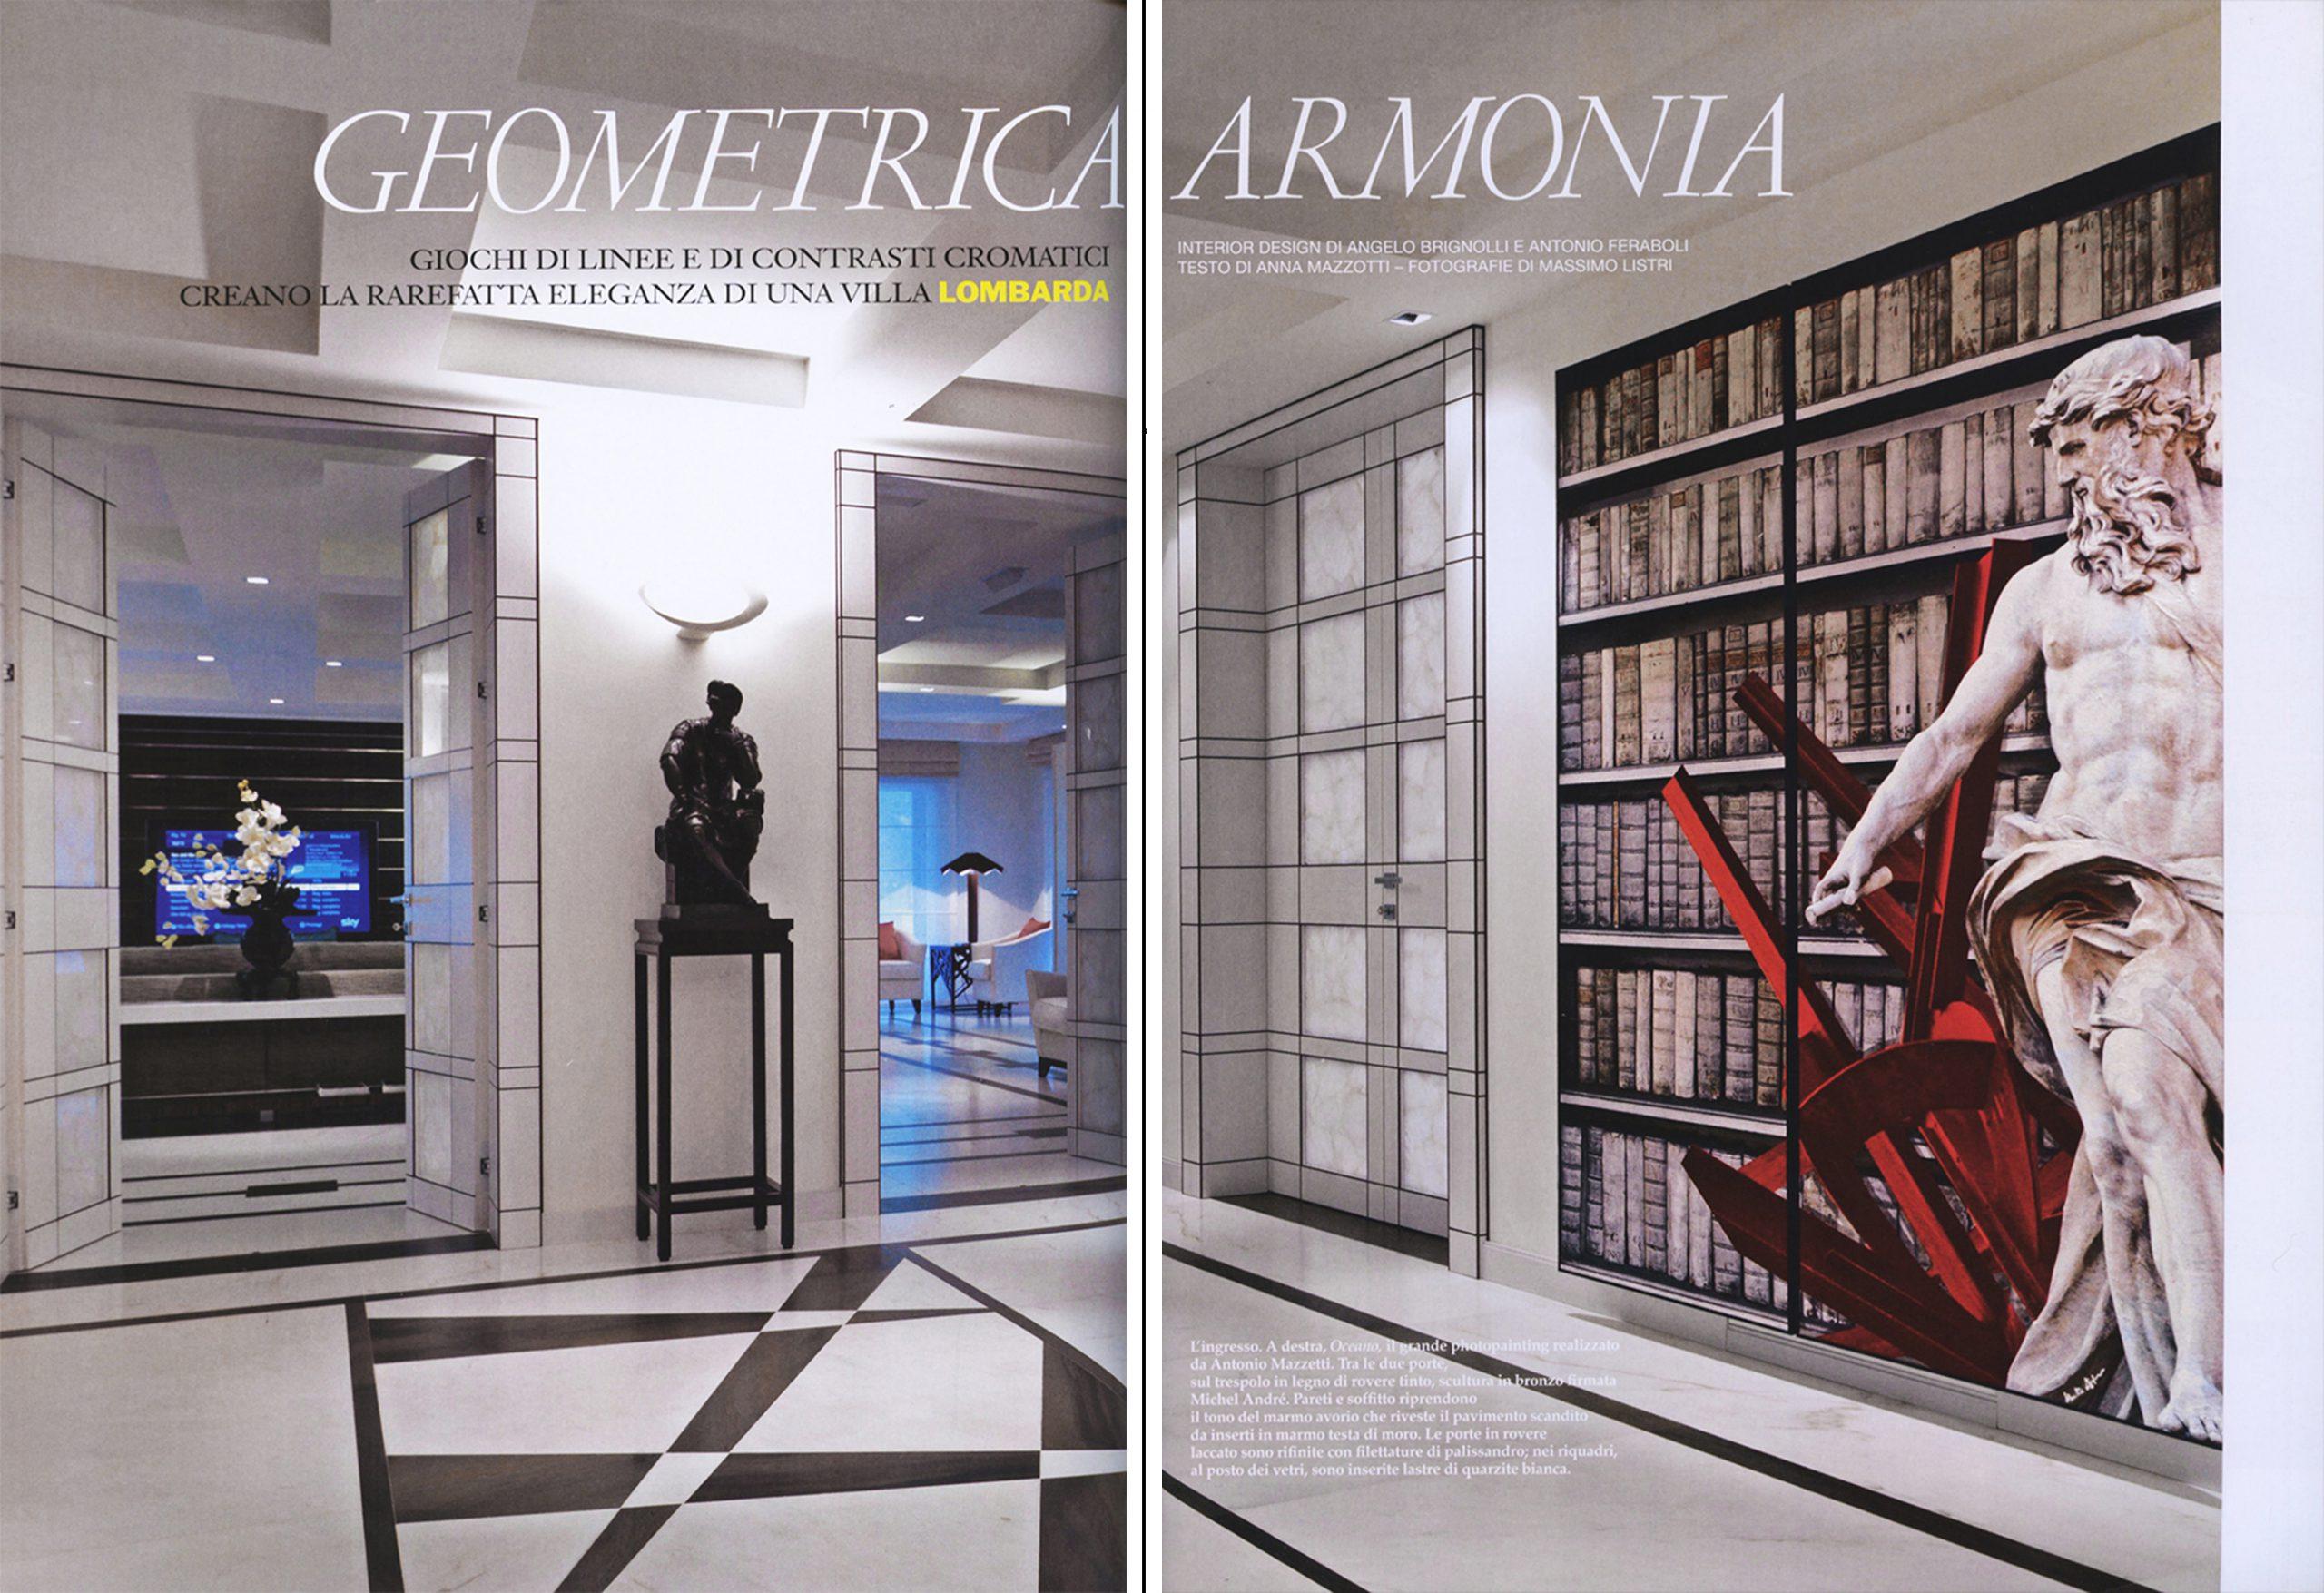 AD - Geometrica armonia